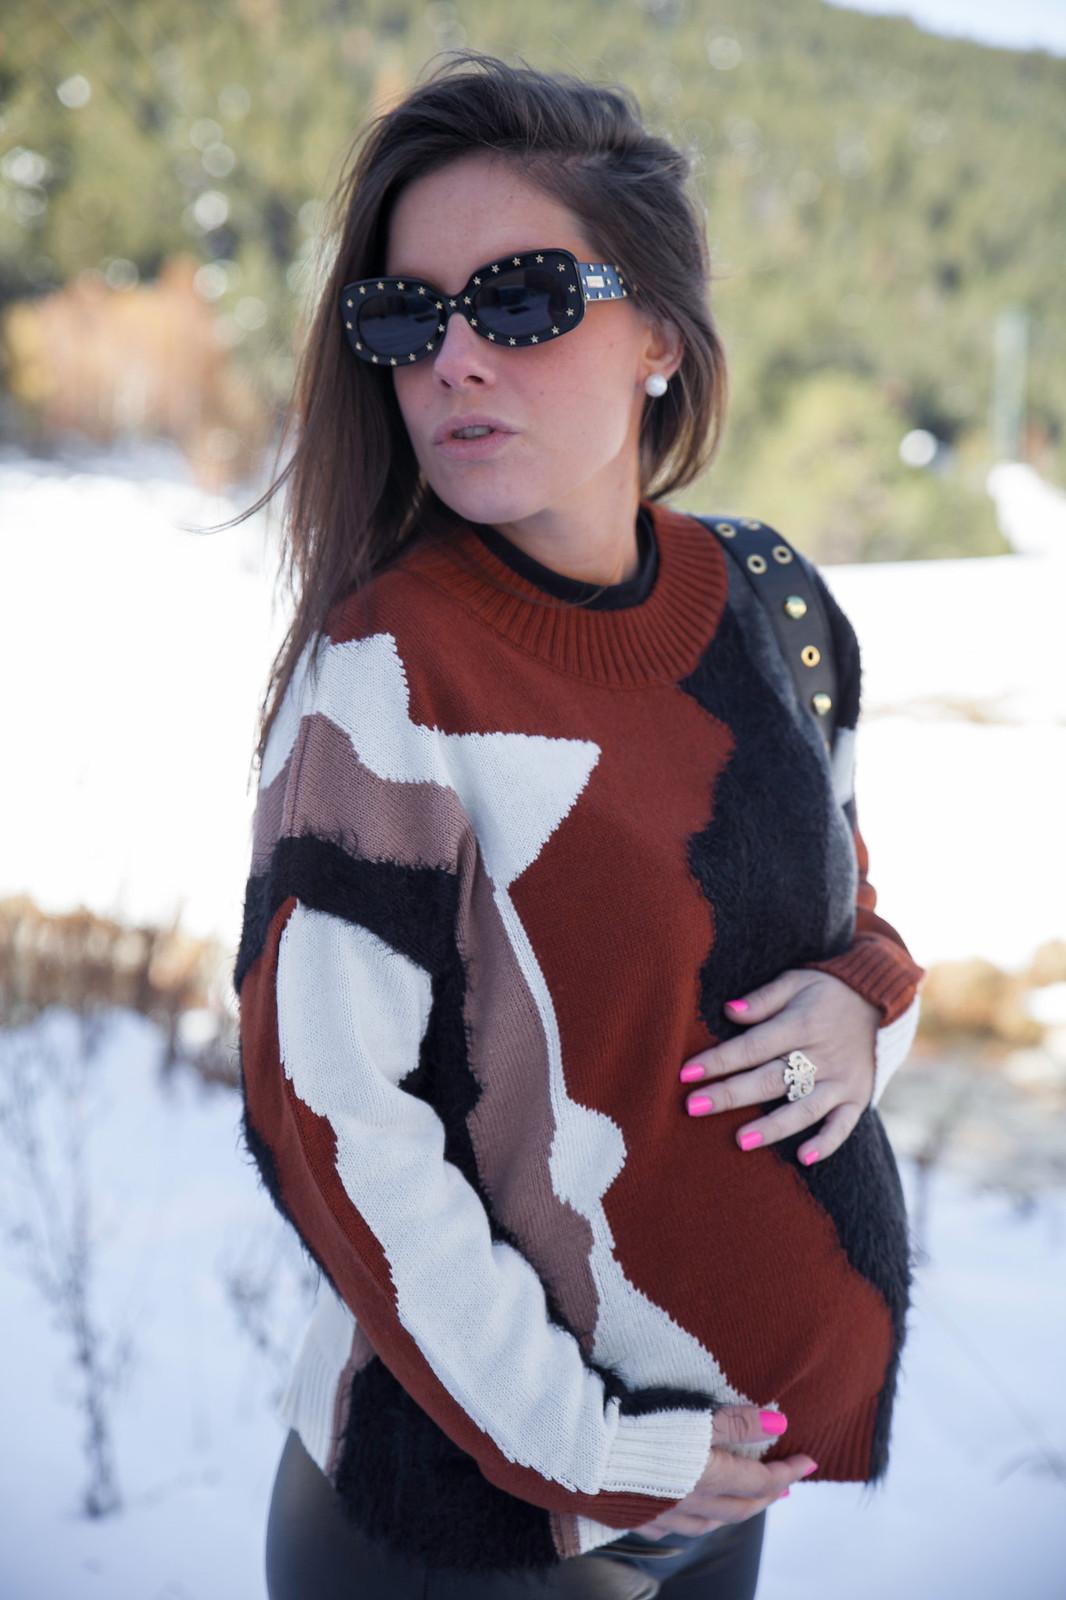 01_combinar_jersey_marron_outfit_nieve_embarazada_theguestgirl_embarazo_33semanas_pregnant_style_influencer_barcelona